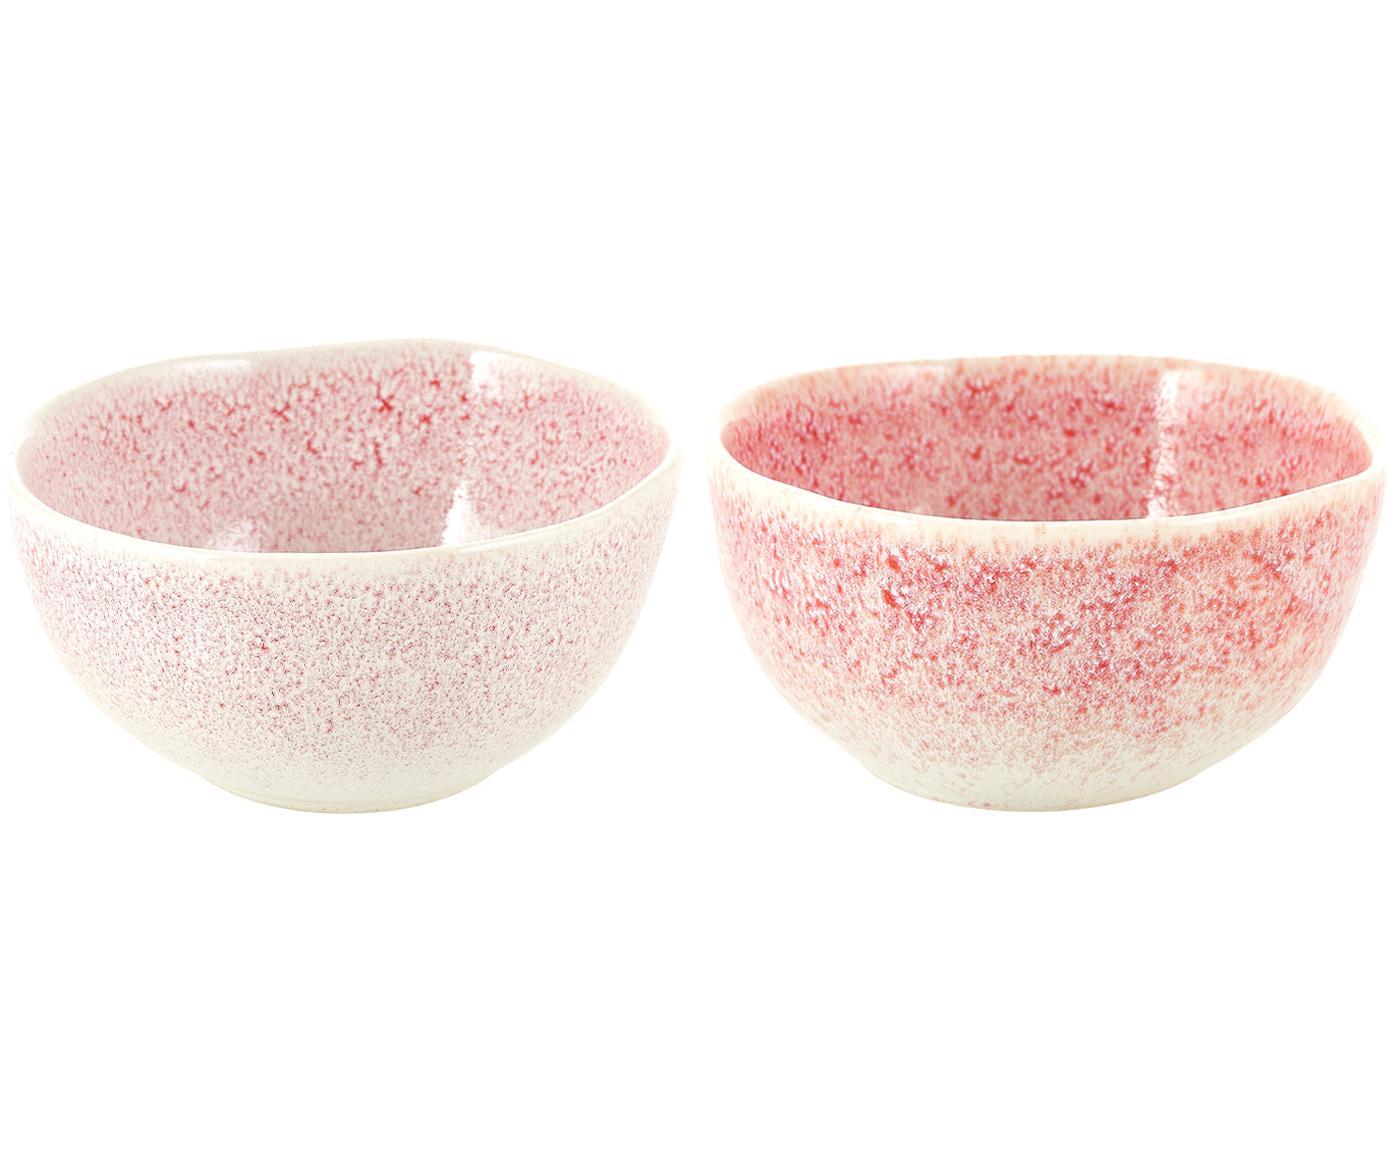 Boles artesanales Amalia, 2uds., Cerámica, Rosa pálido, blanco crema, Ø 14 x Al 7 cm